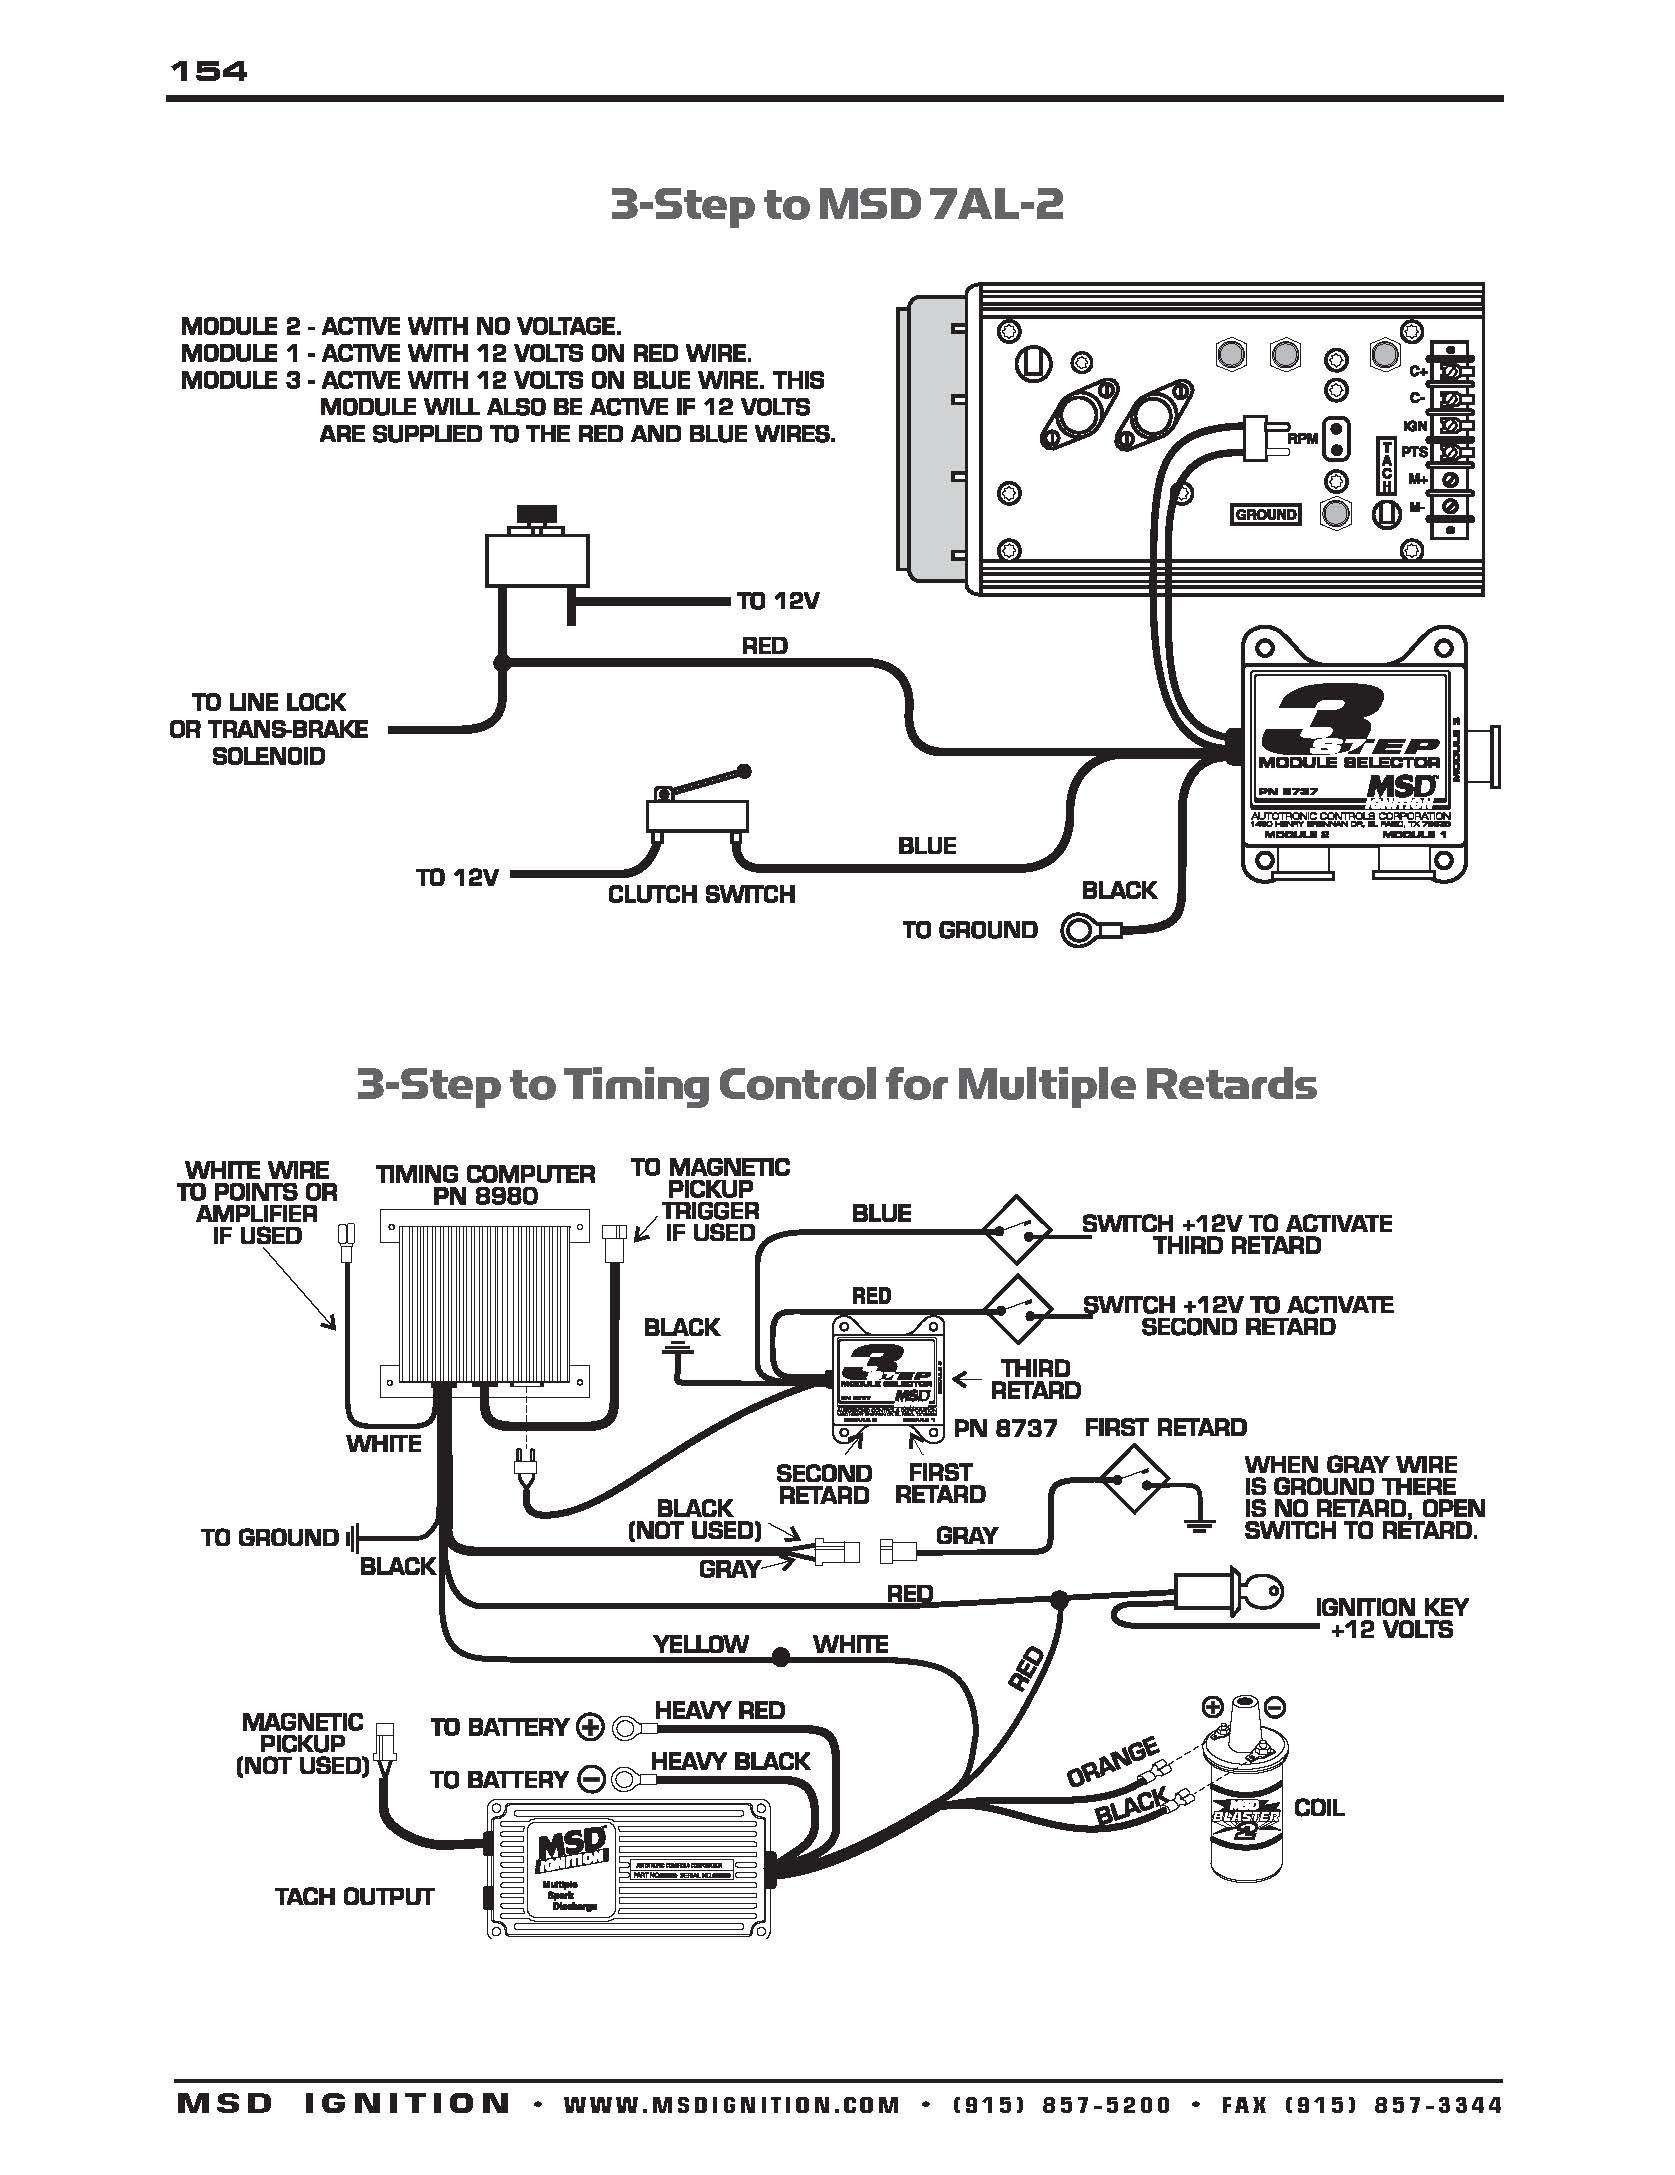 Msd Ignition System Wiring Diagram Inspirationa Msd Ignition Wiring Diagrams Brianesser and Msd 6al Diagram